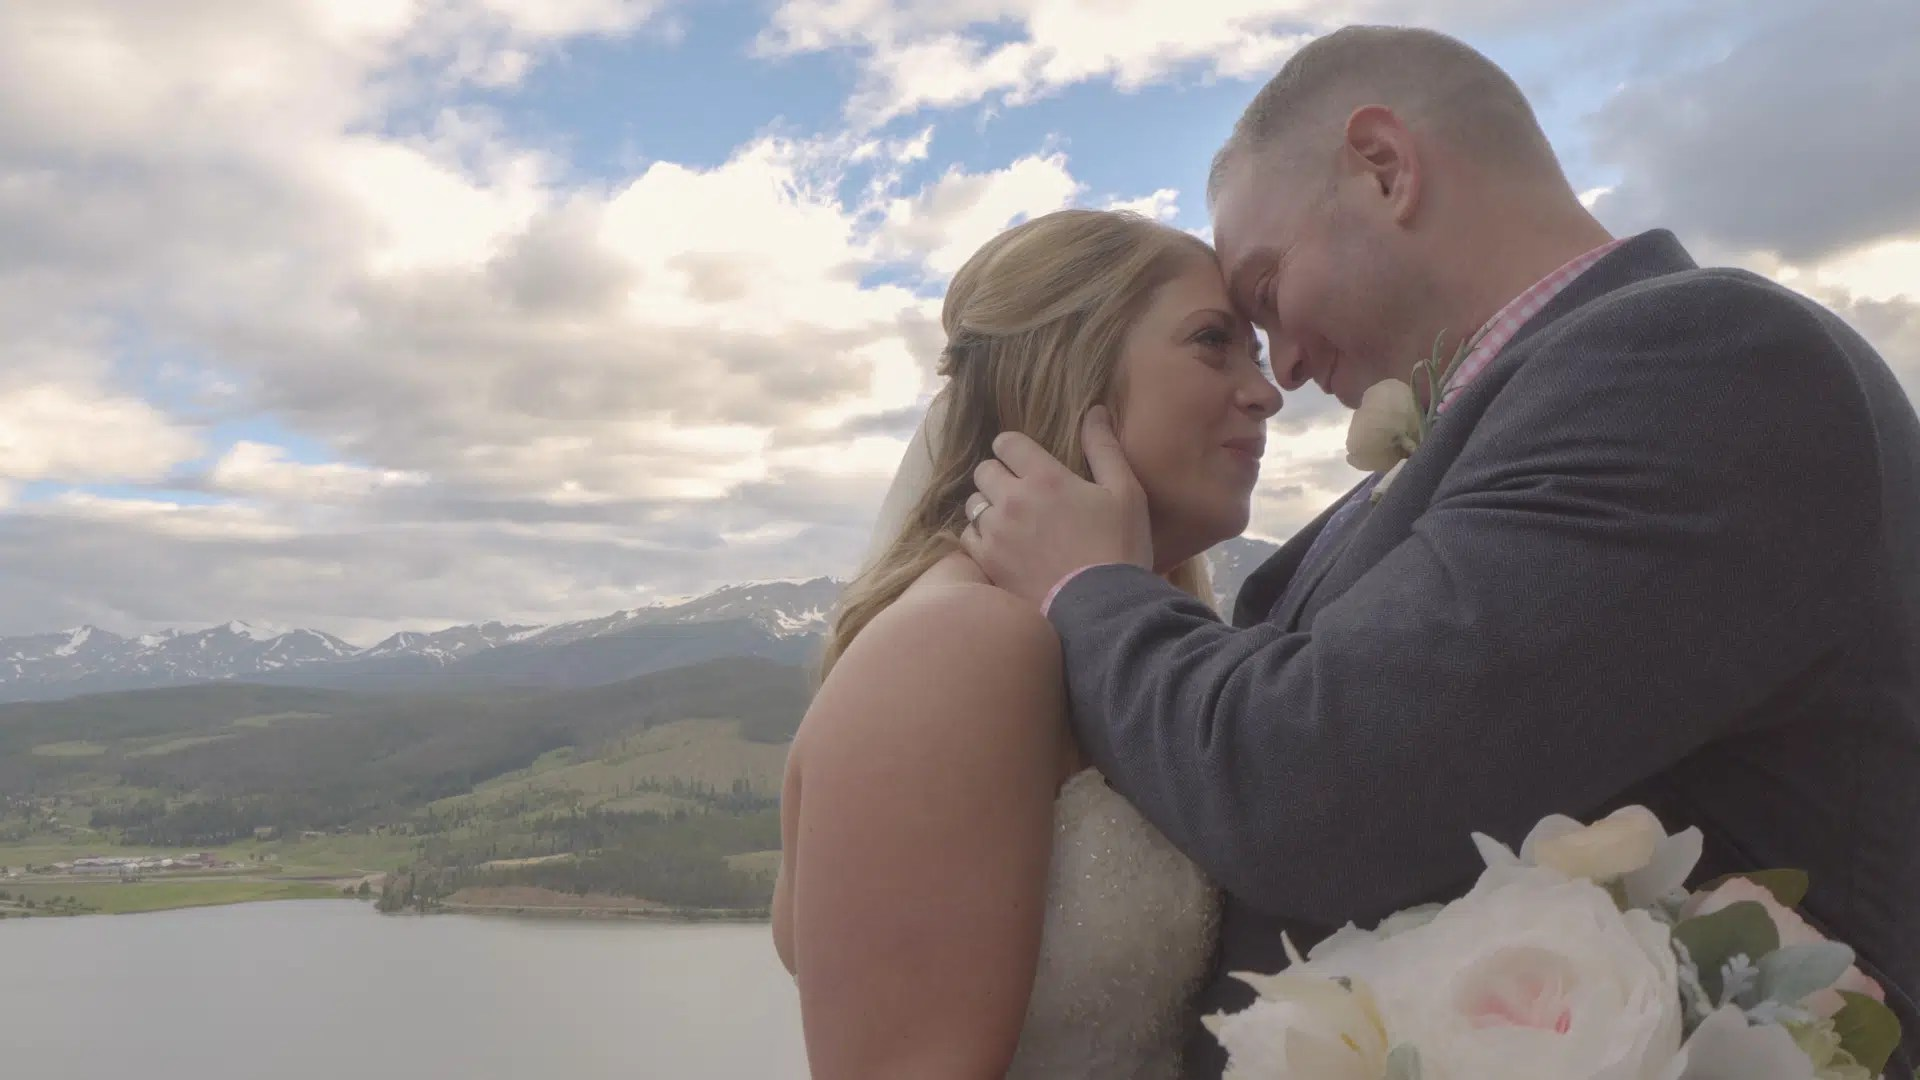 Andrew & Kylie Wedding @ Breckenridge, CO